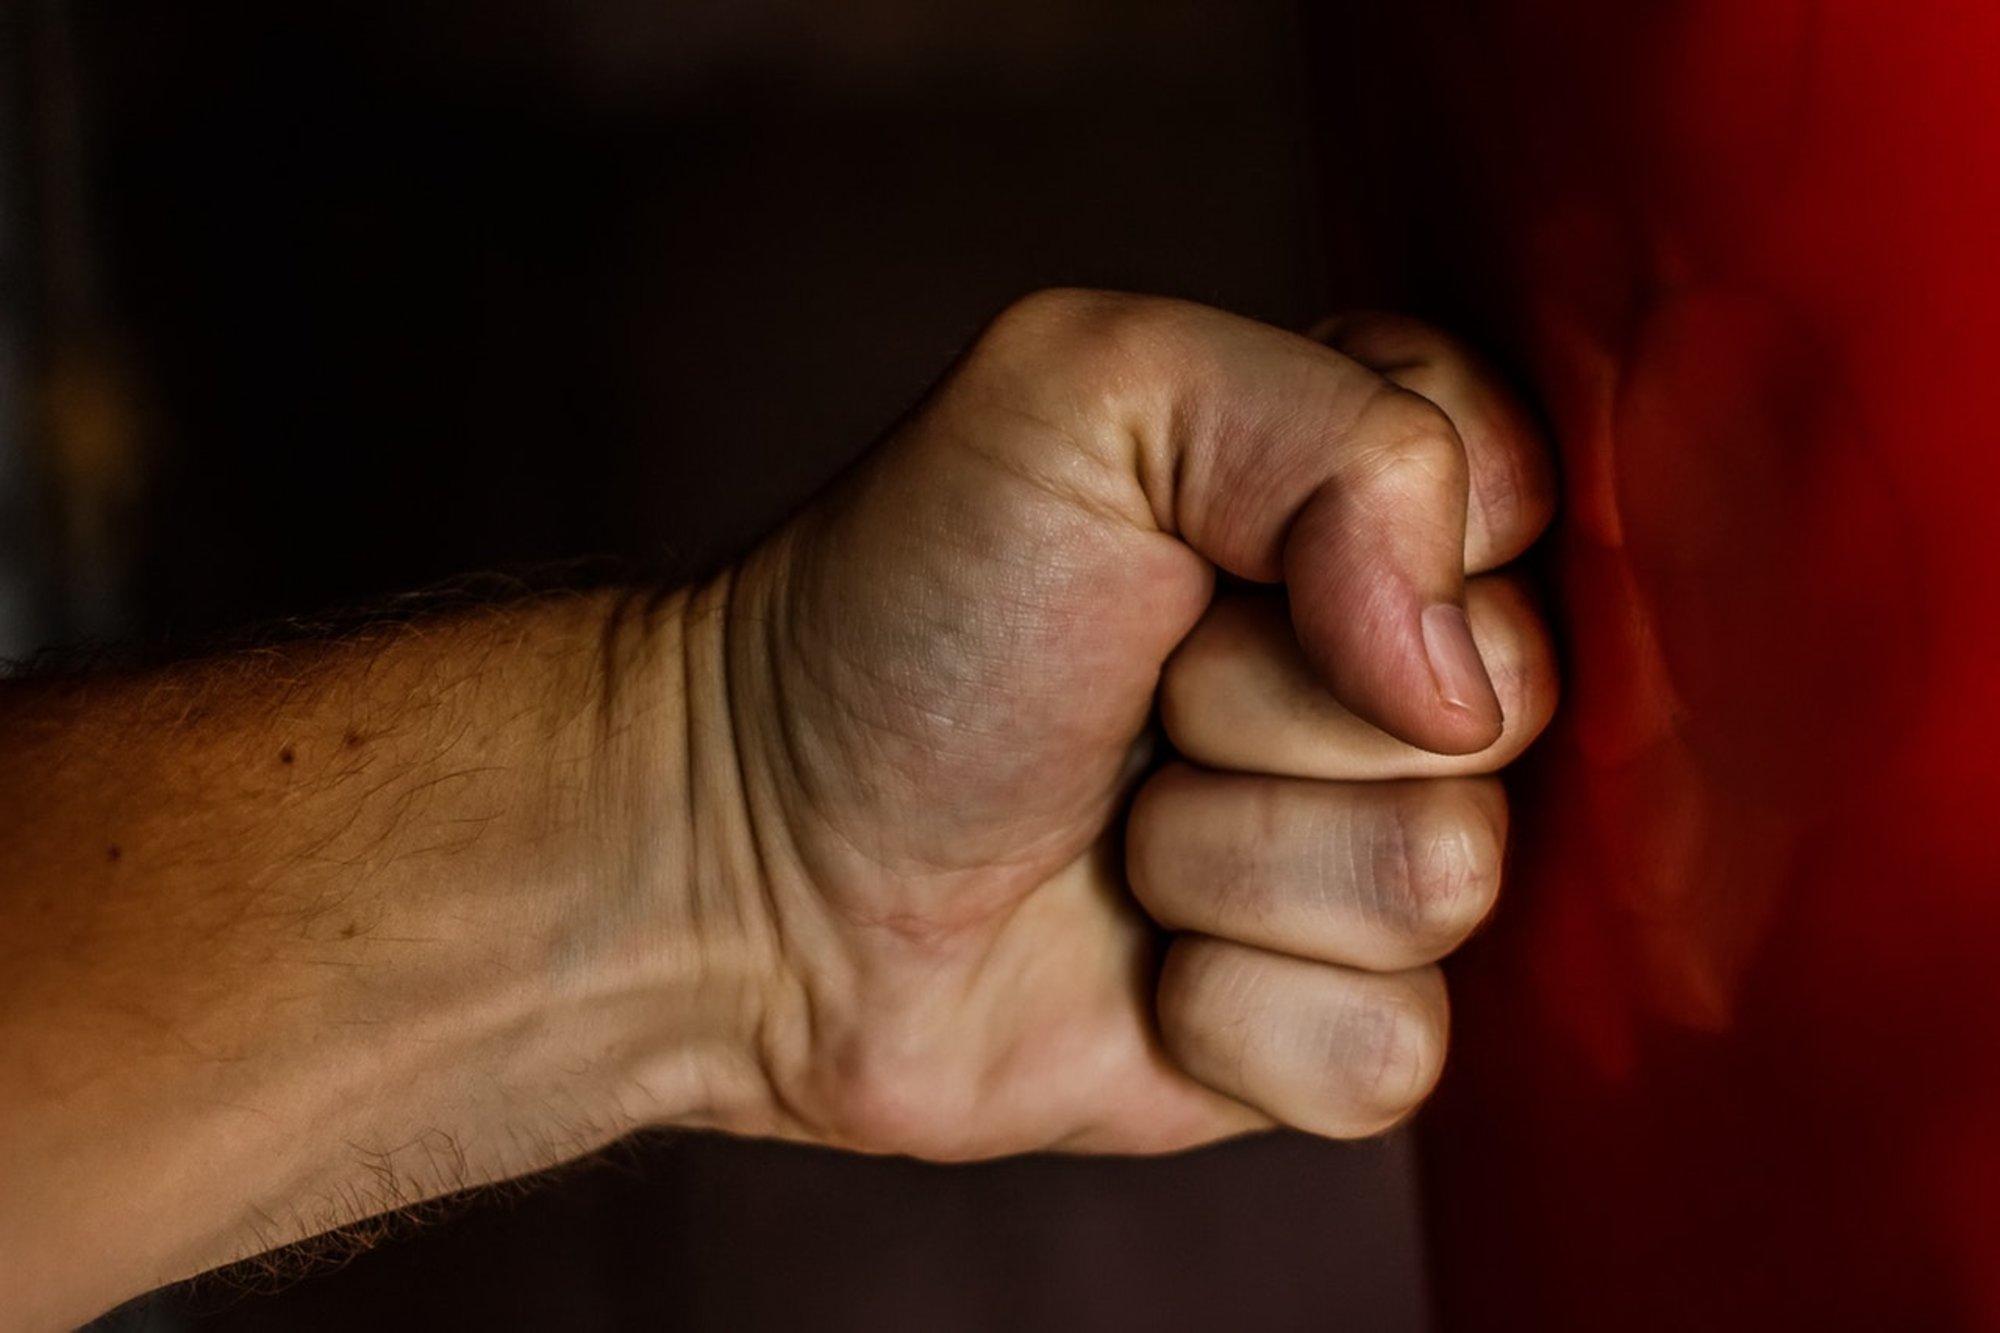 fist-punch.jpg